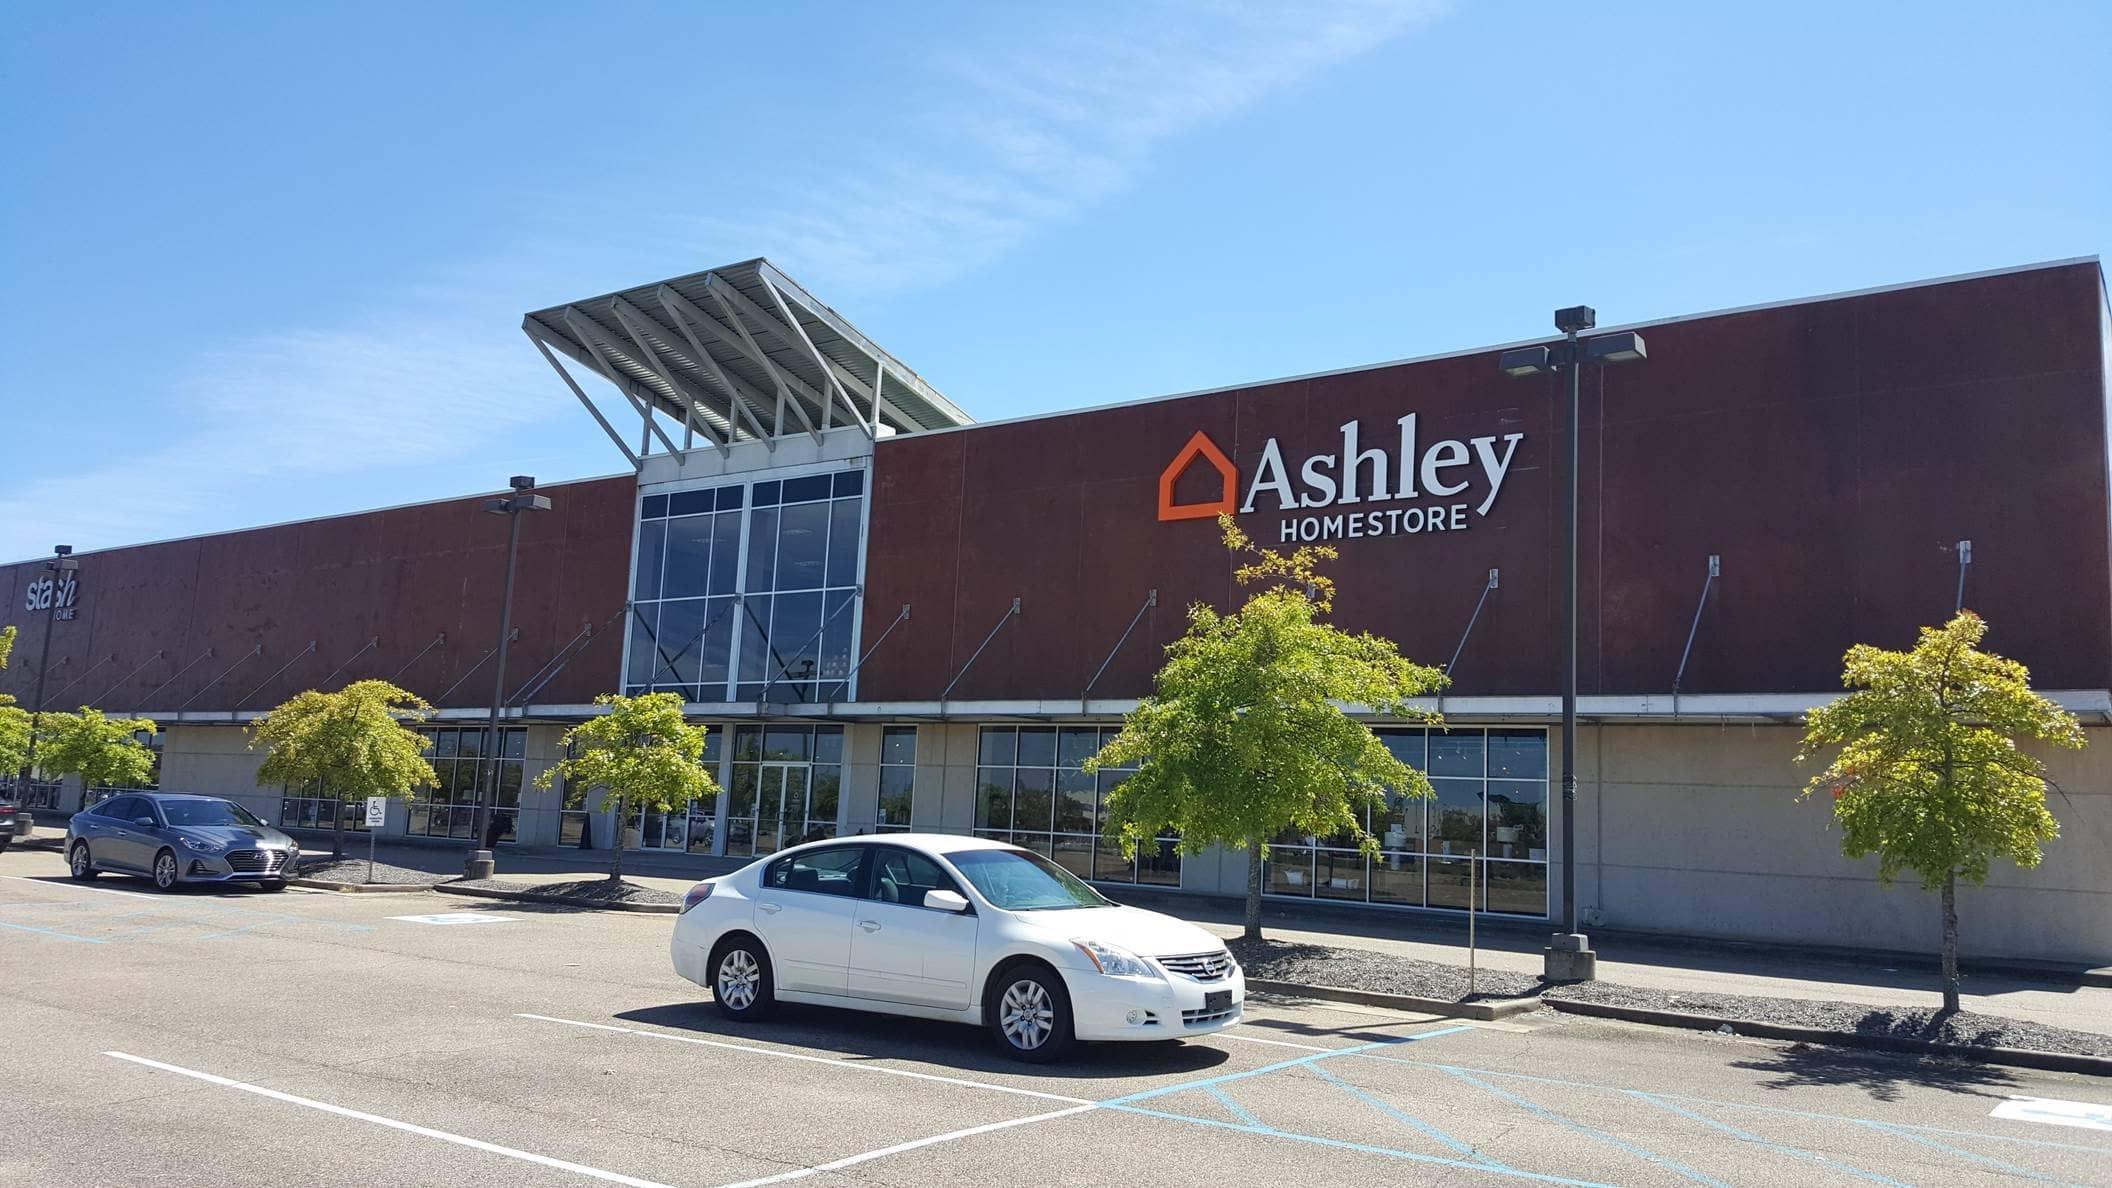 Delicieux Ashley HomeStore   Ashley Furniture